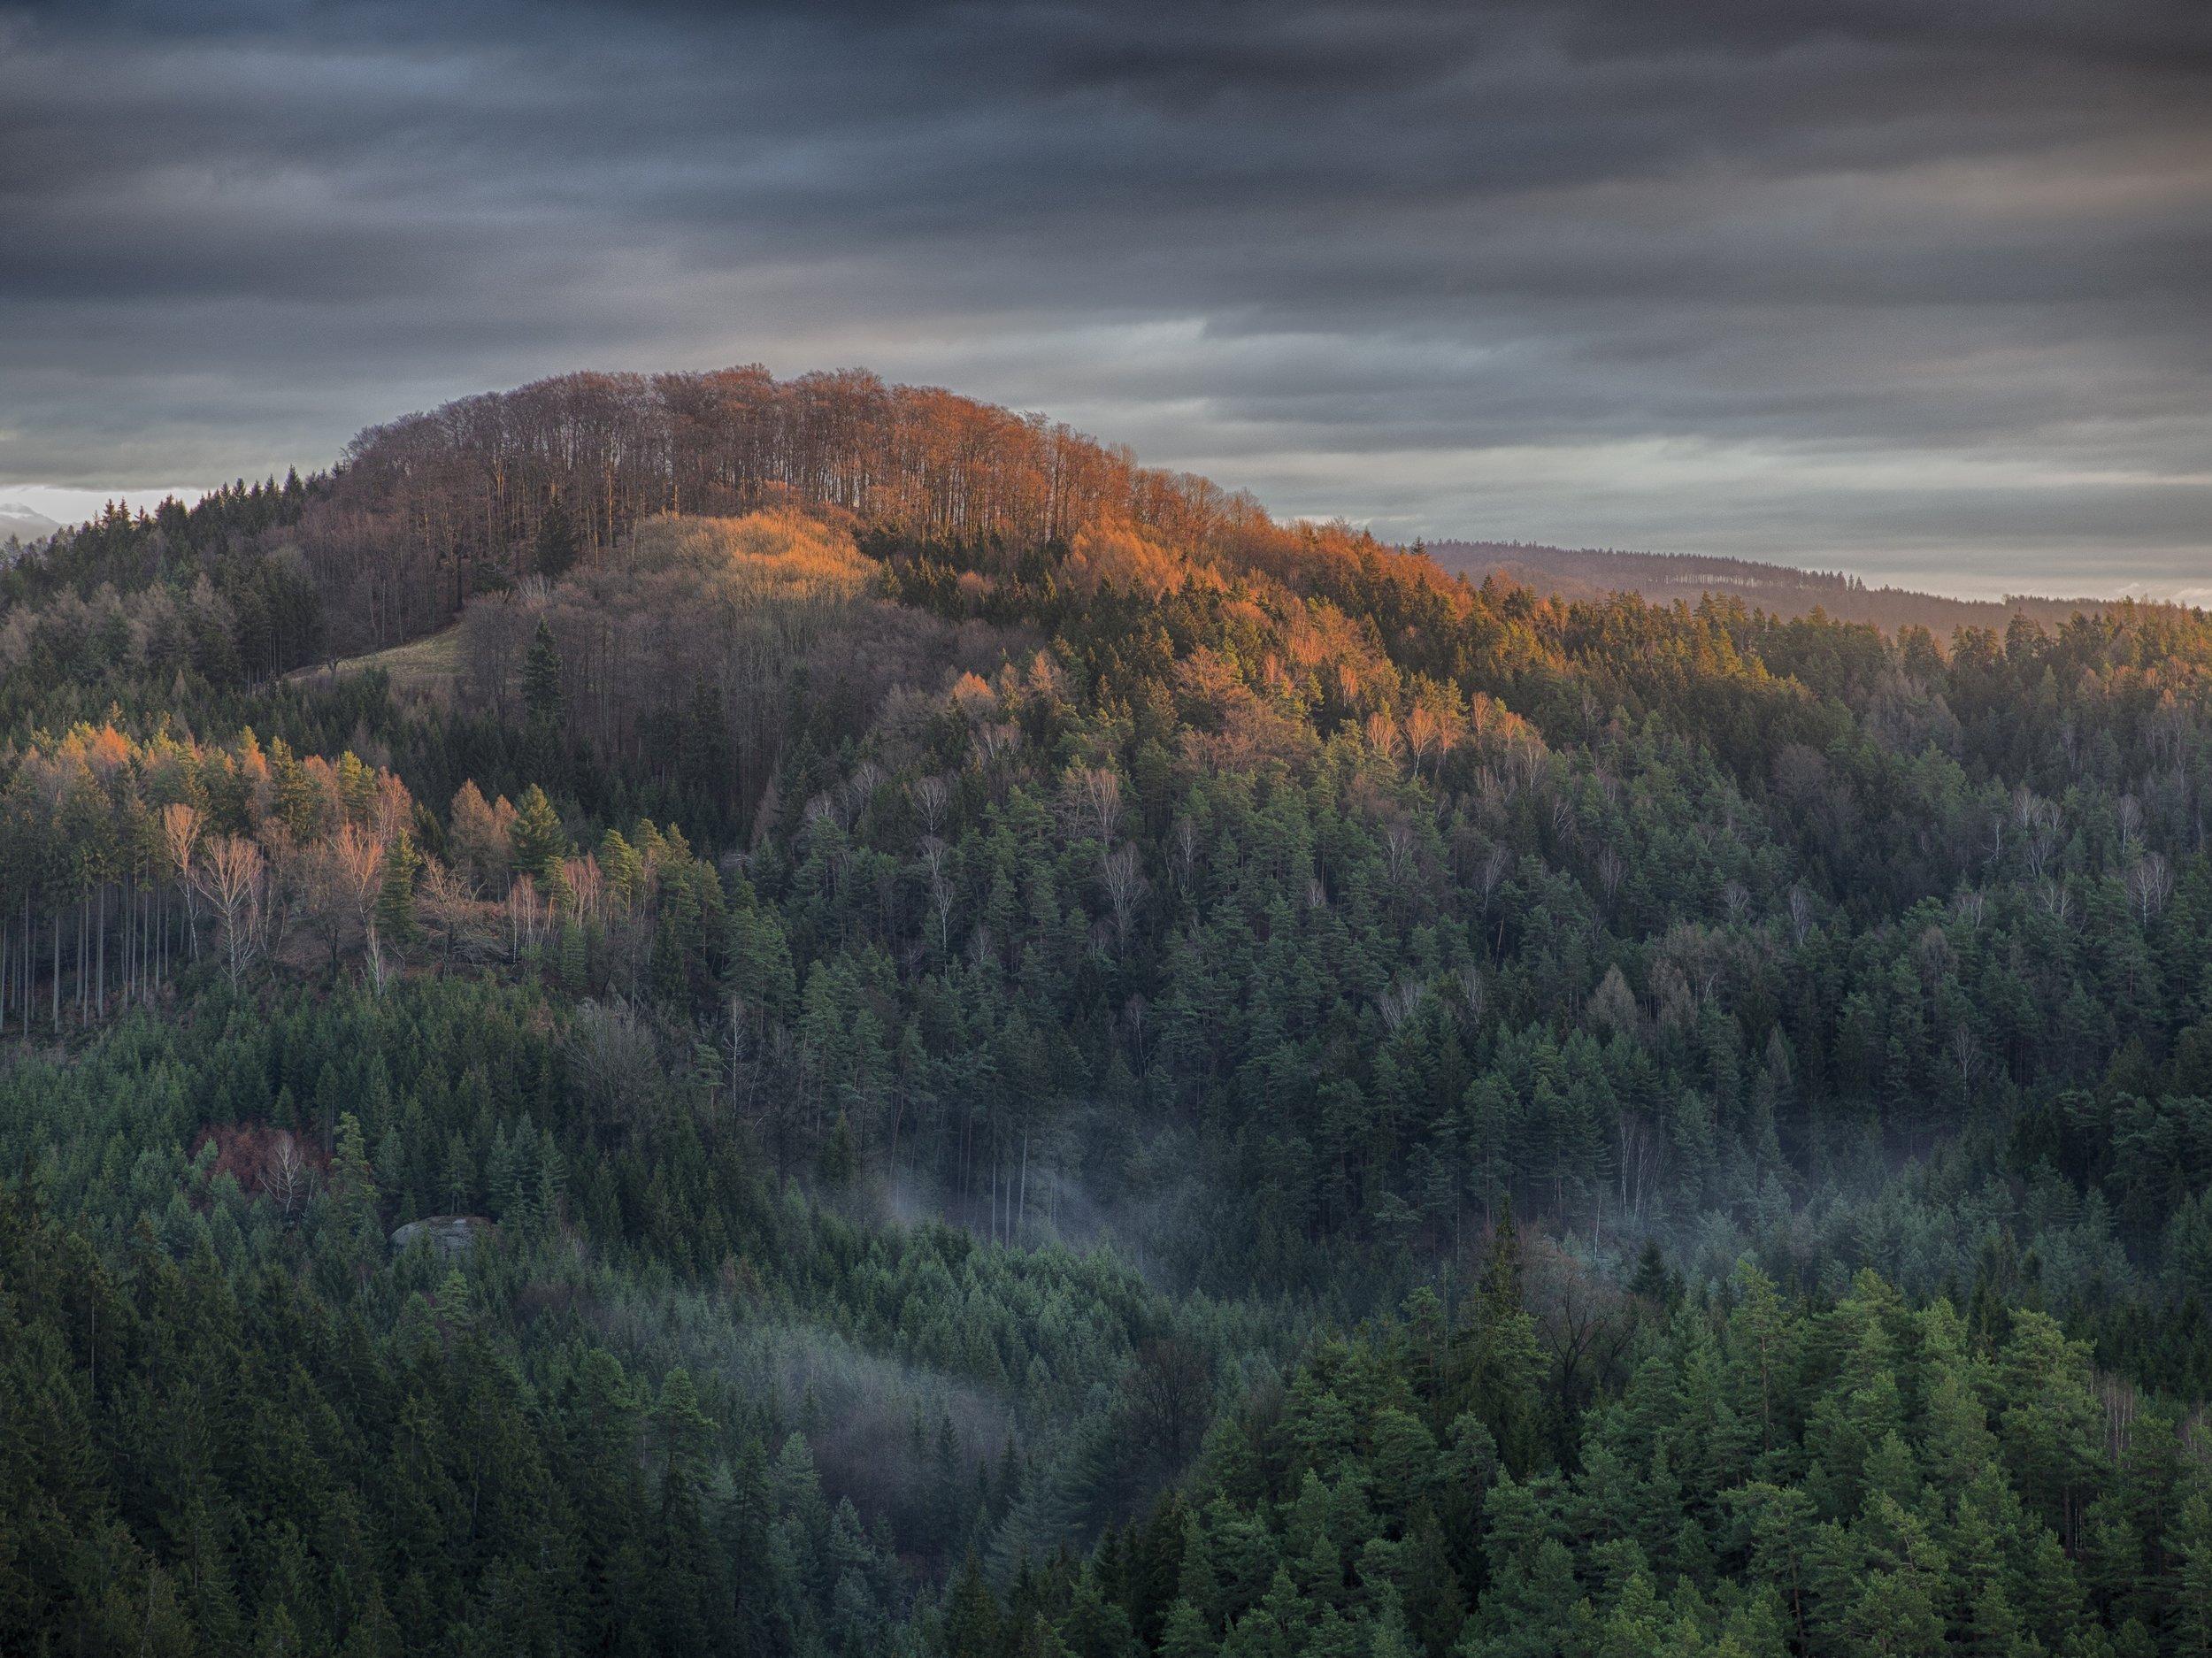 forest-ipad.jpg